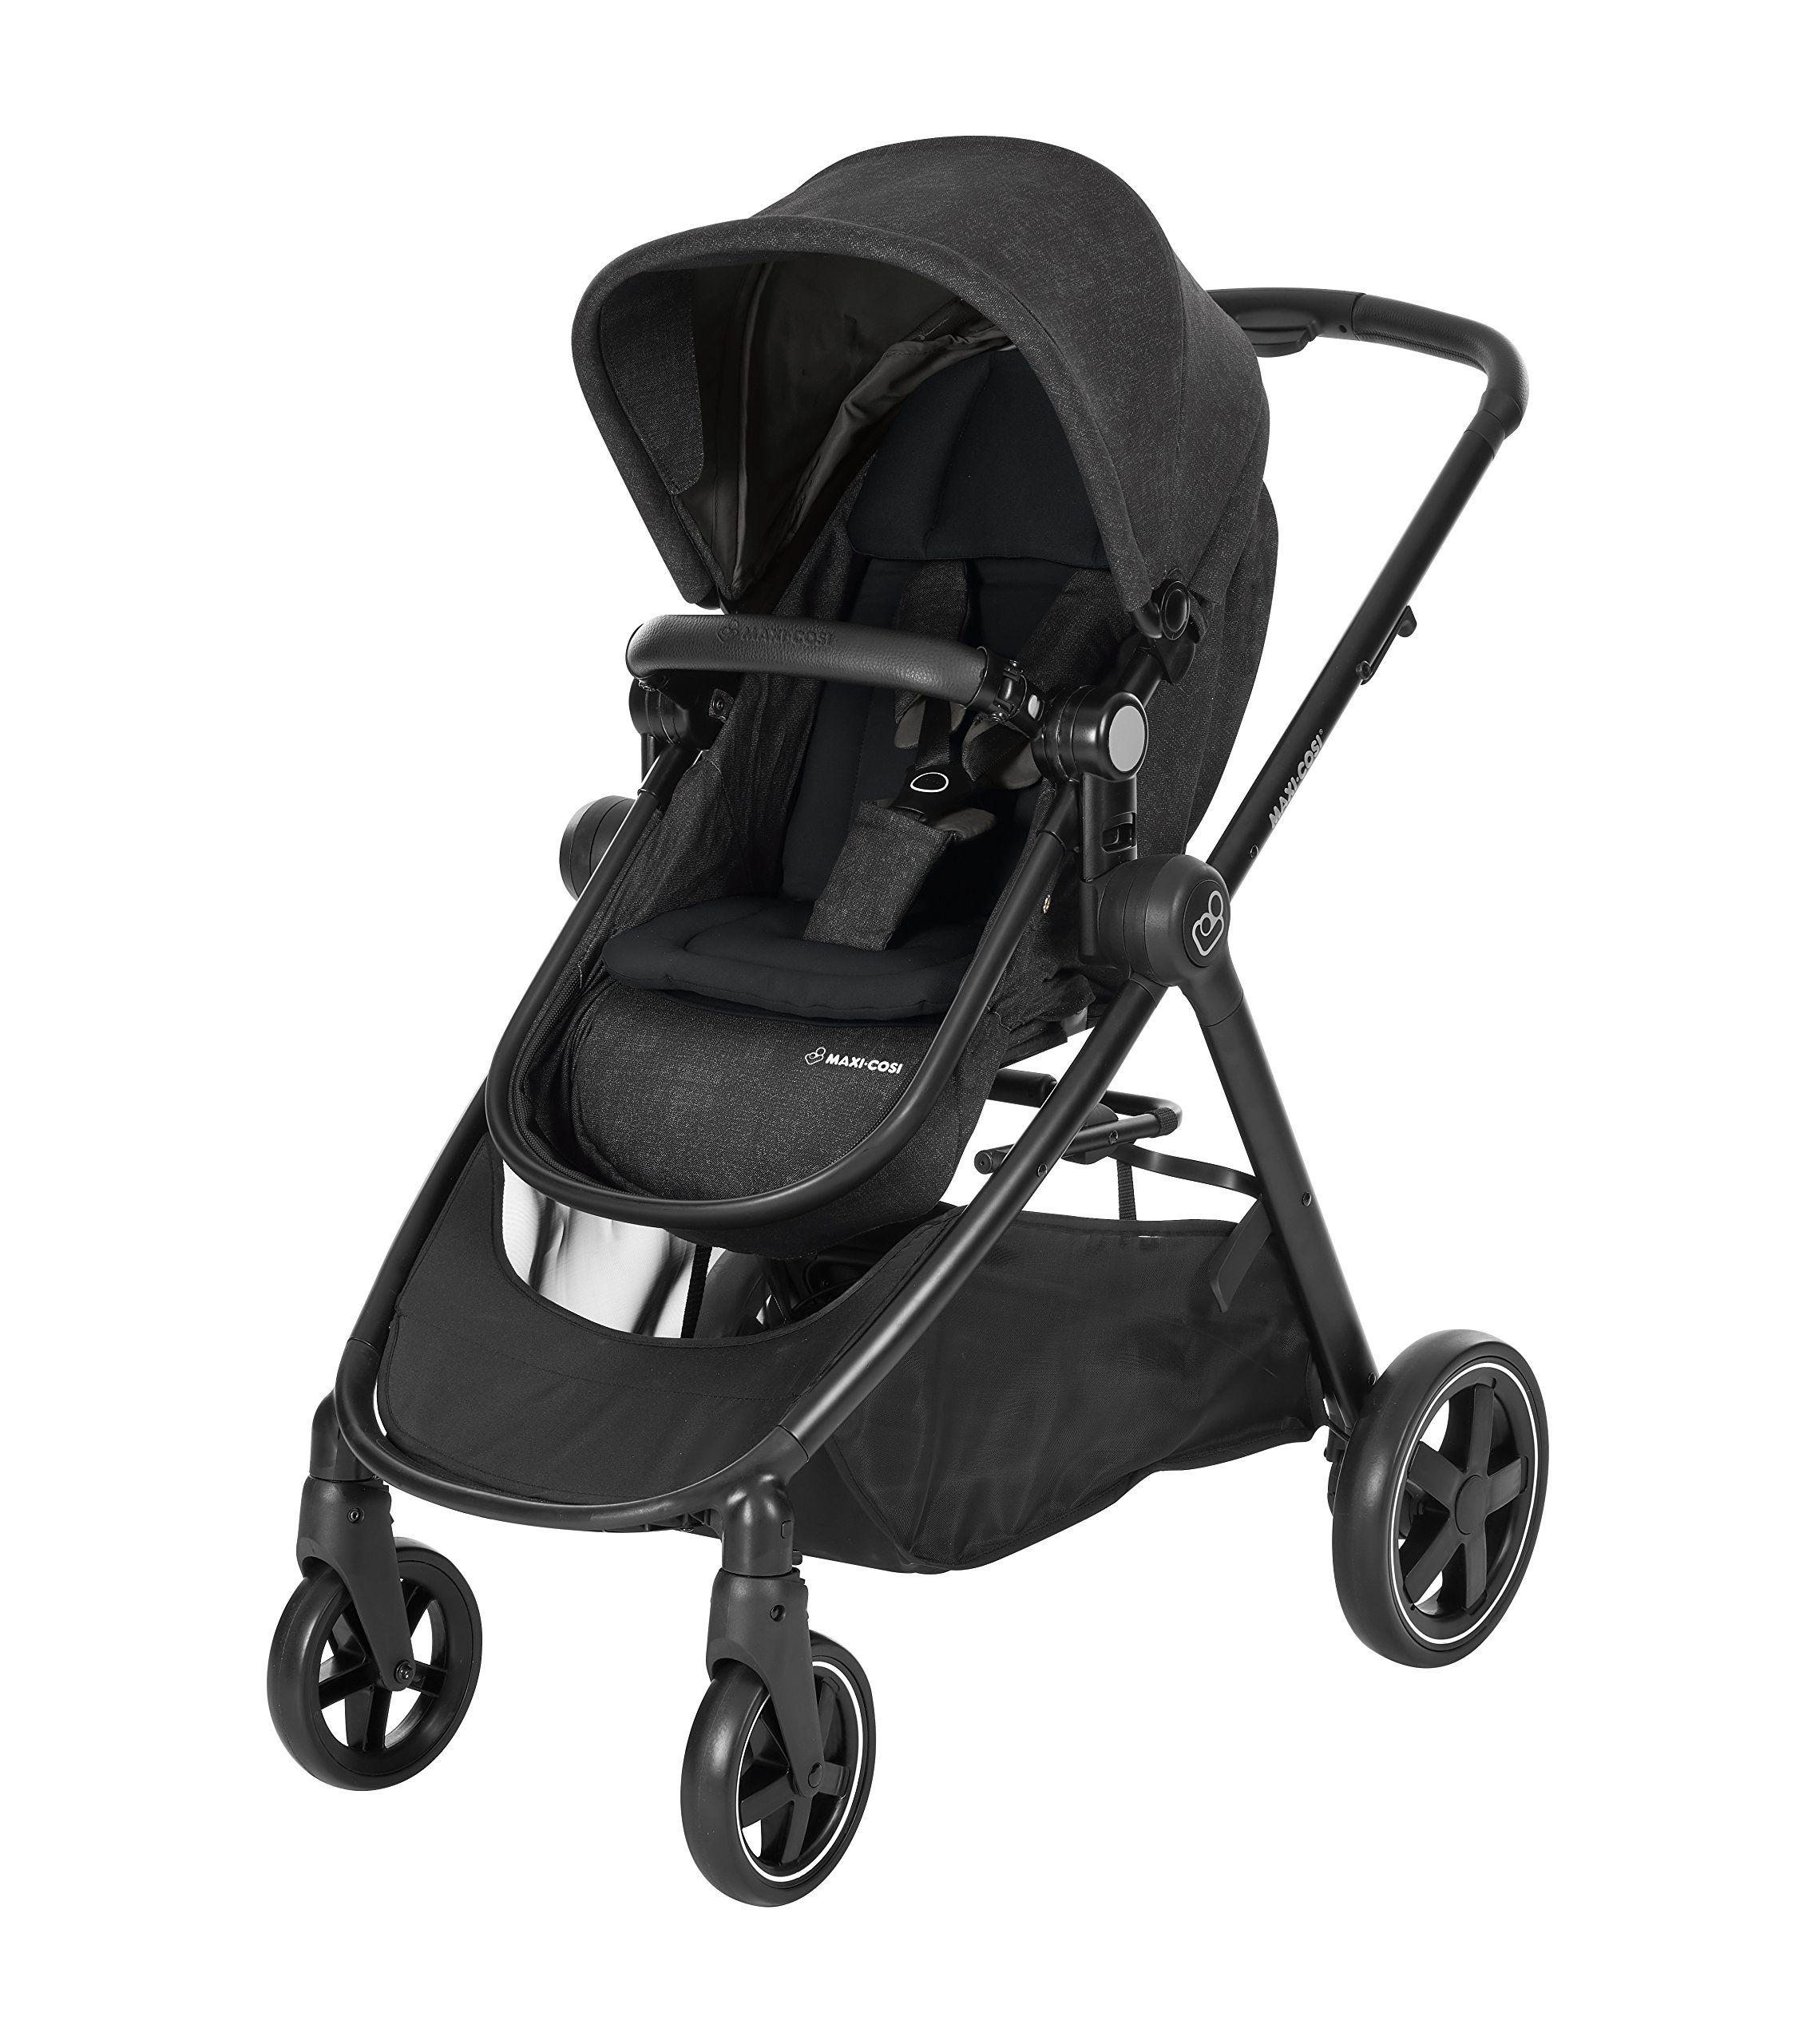 MaxiCosi Zelia Baby Pushchair, Lightweight Urban Stroller